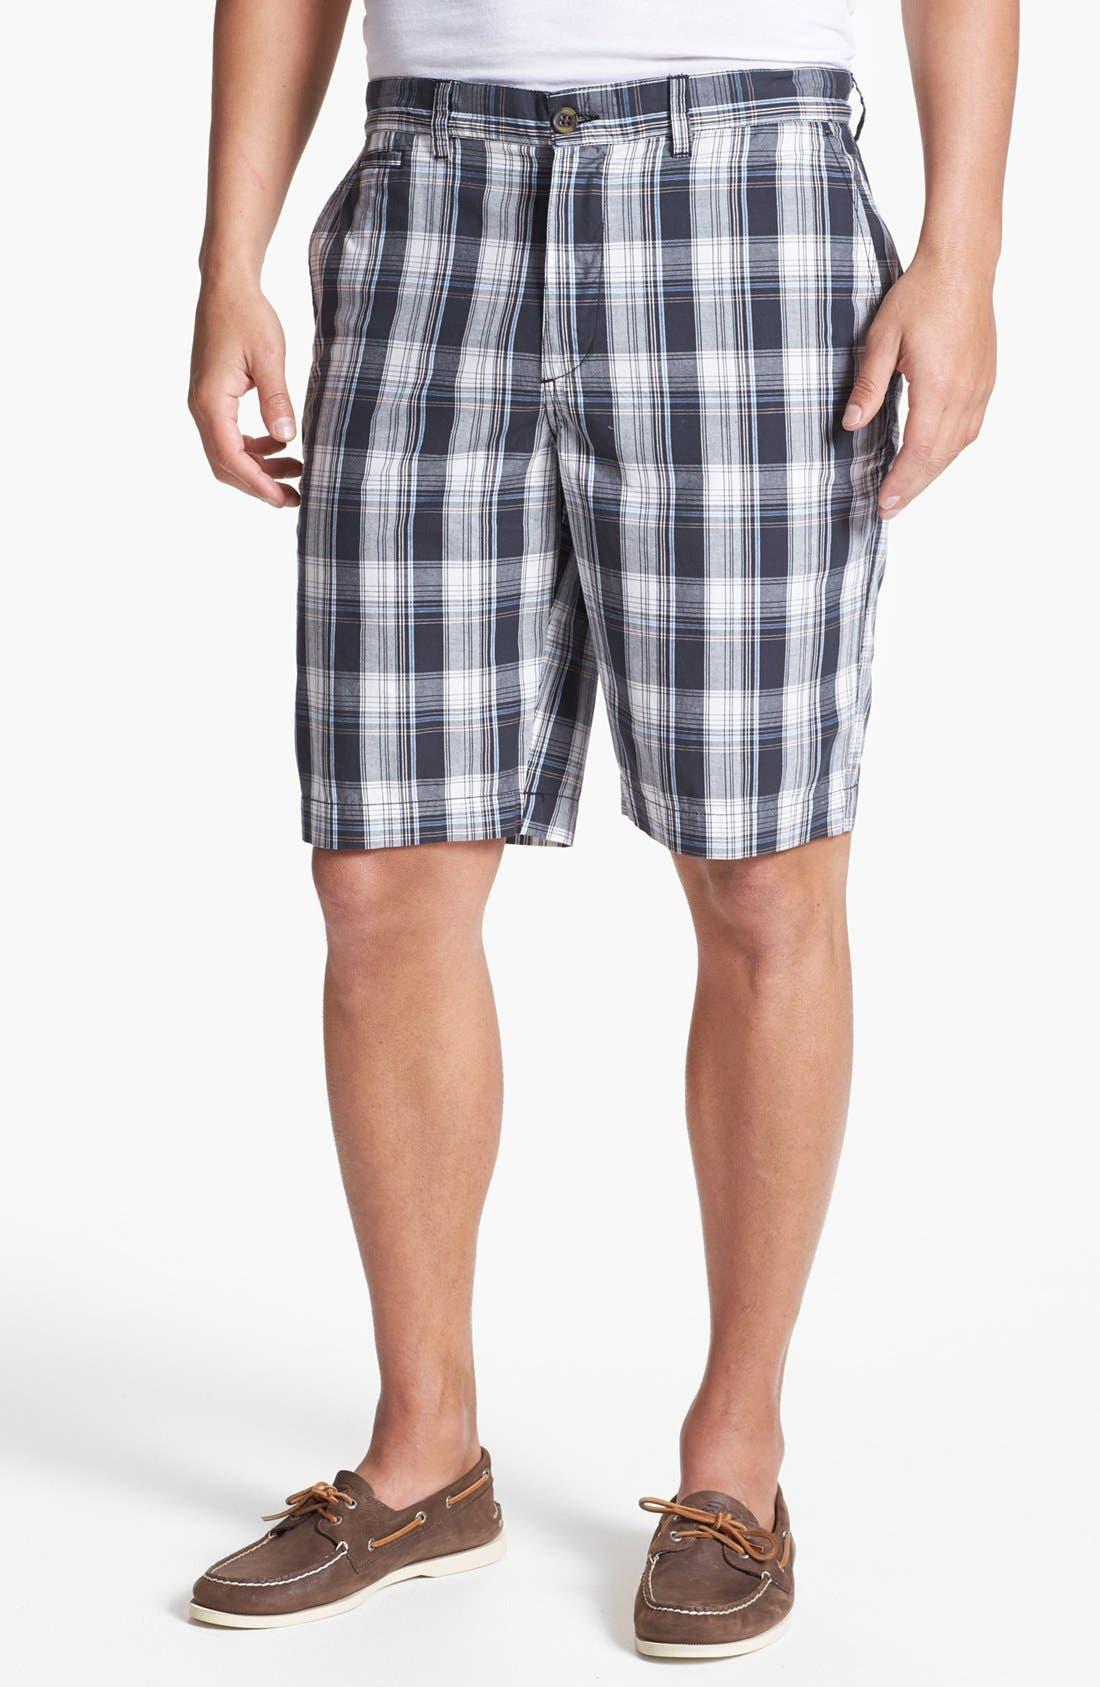 Alternate Image 1 Selected - Wallin & Bros. 'Lanspur' Shorts